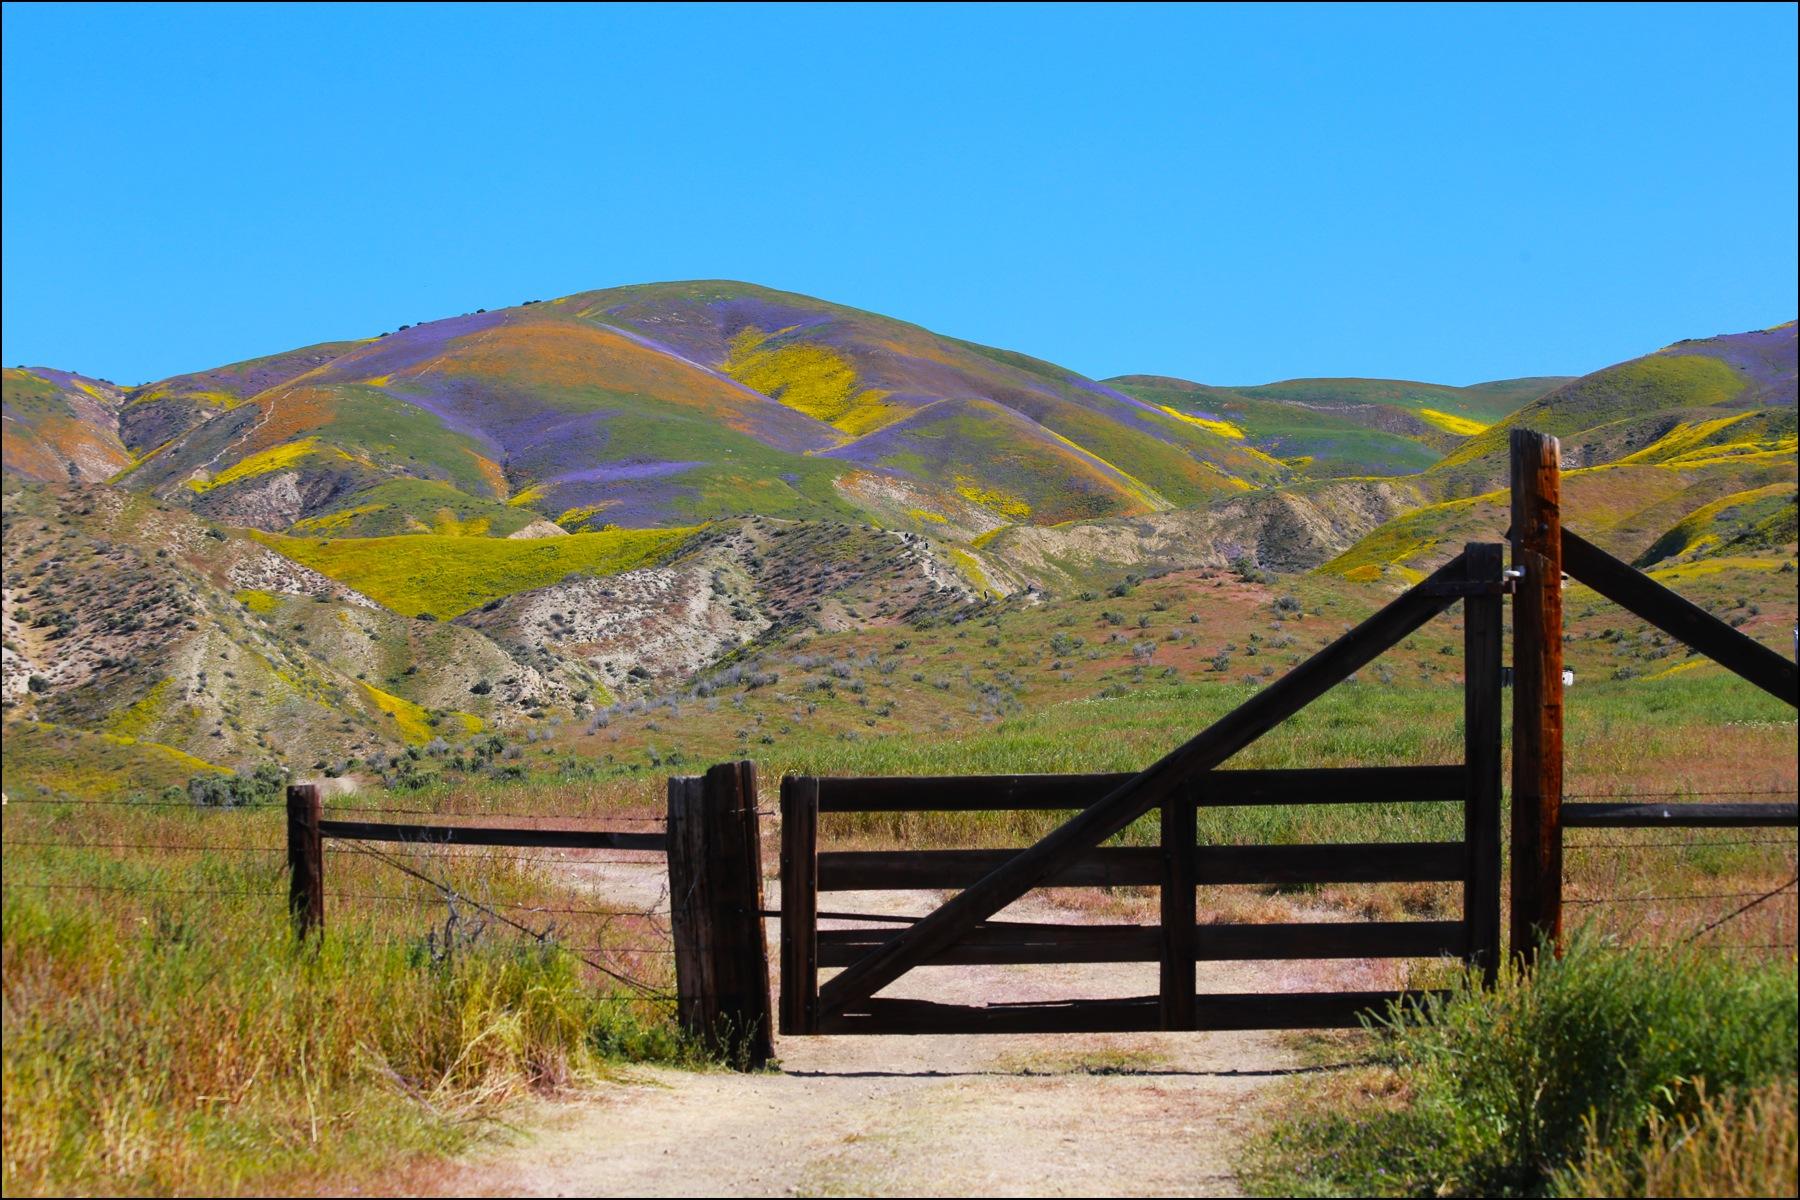 Gateway to beauty by Linda Ruiz